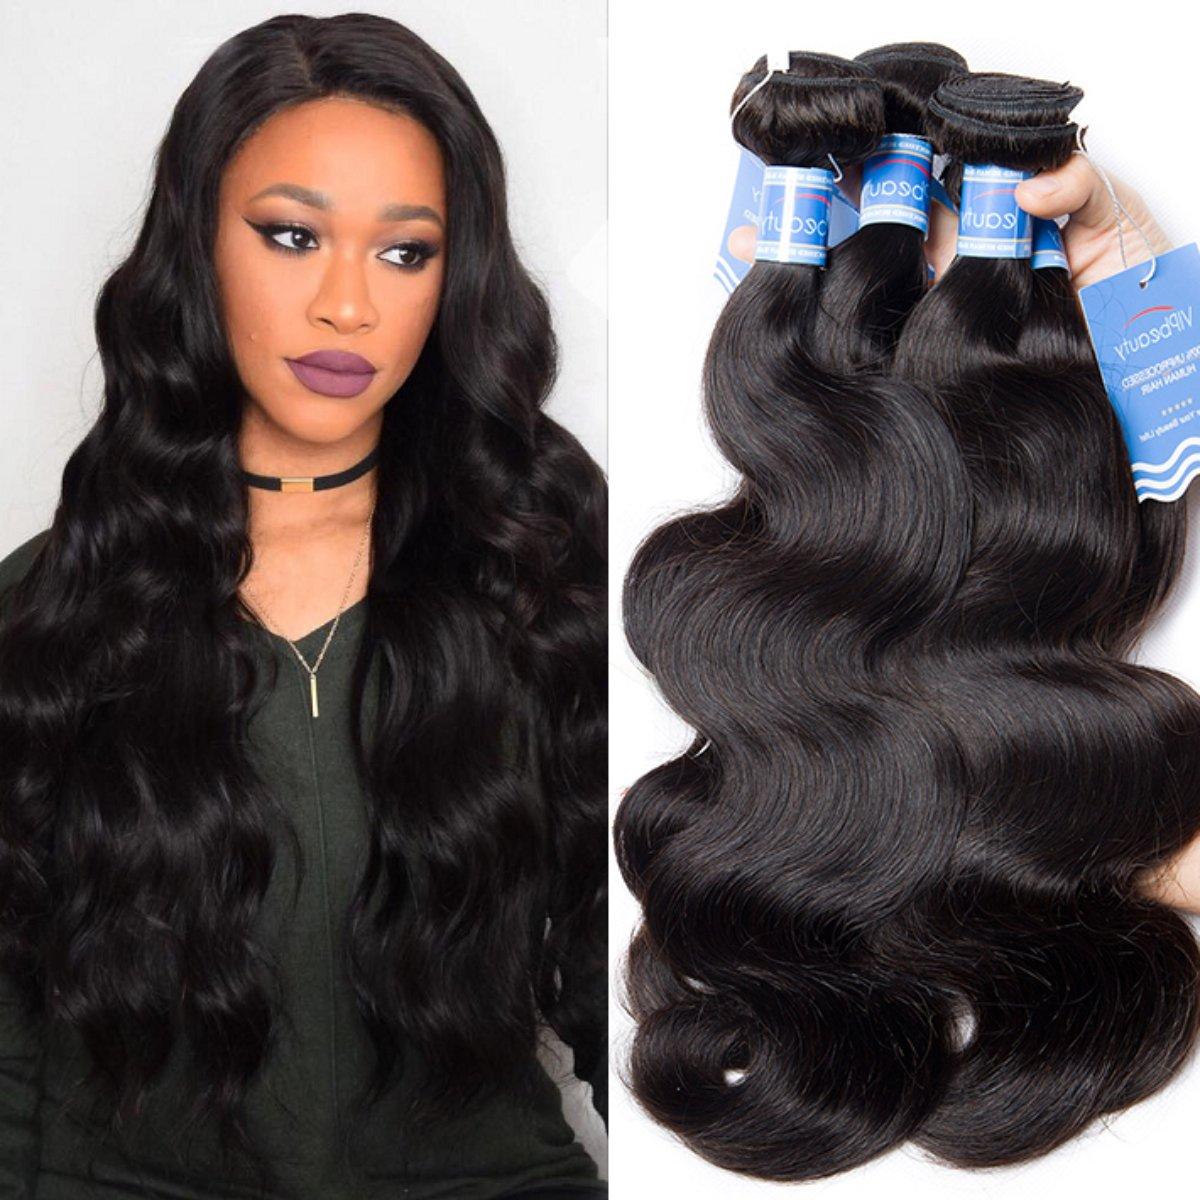 Amazon Vipbeauty 3 Bundles Of Brazilian Hair Body Wave Virgin